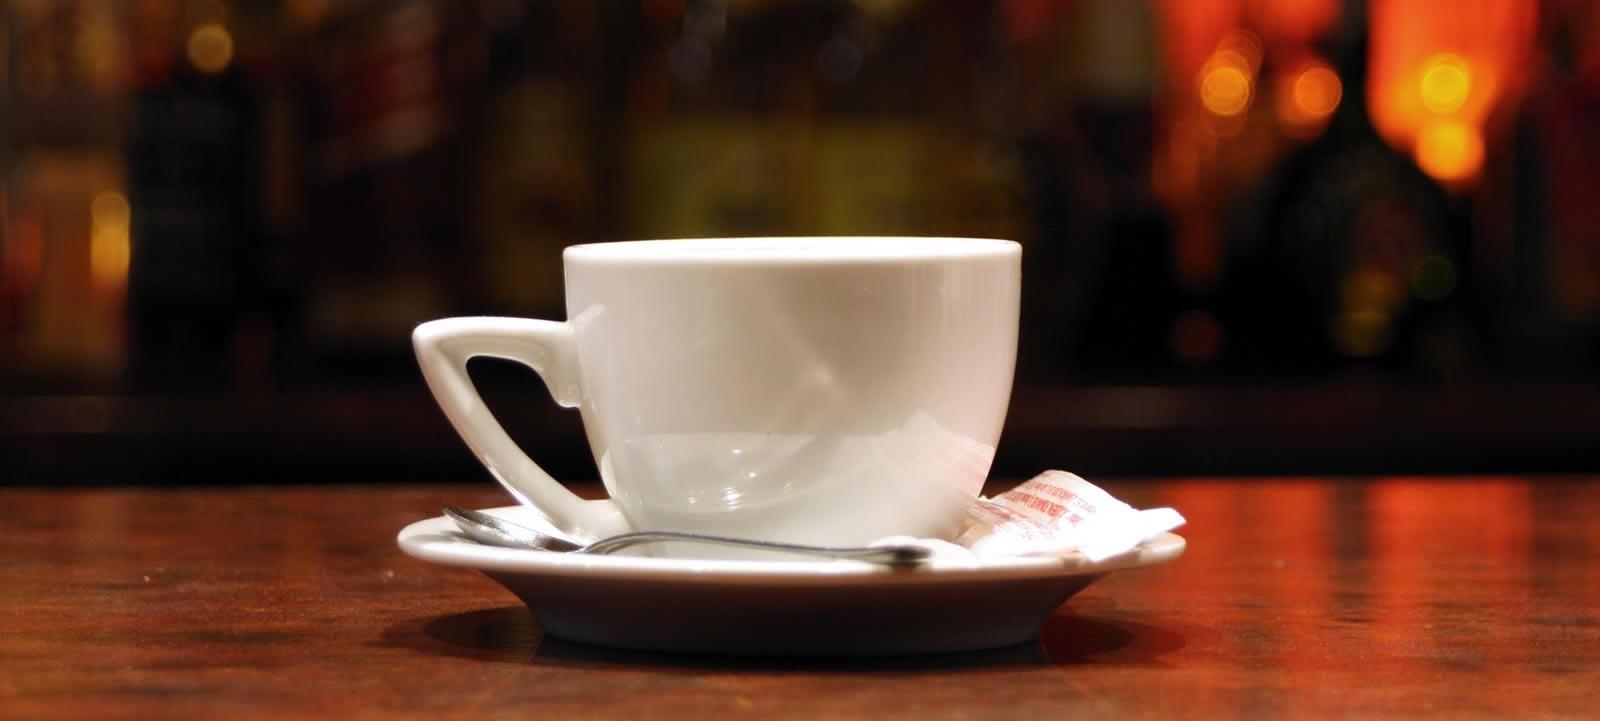 Cafei i barovi